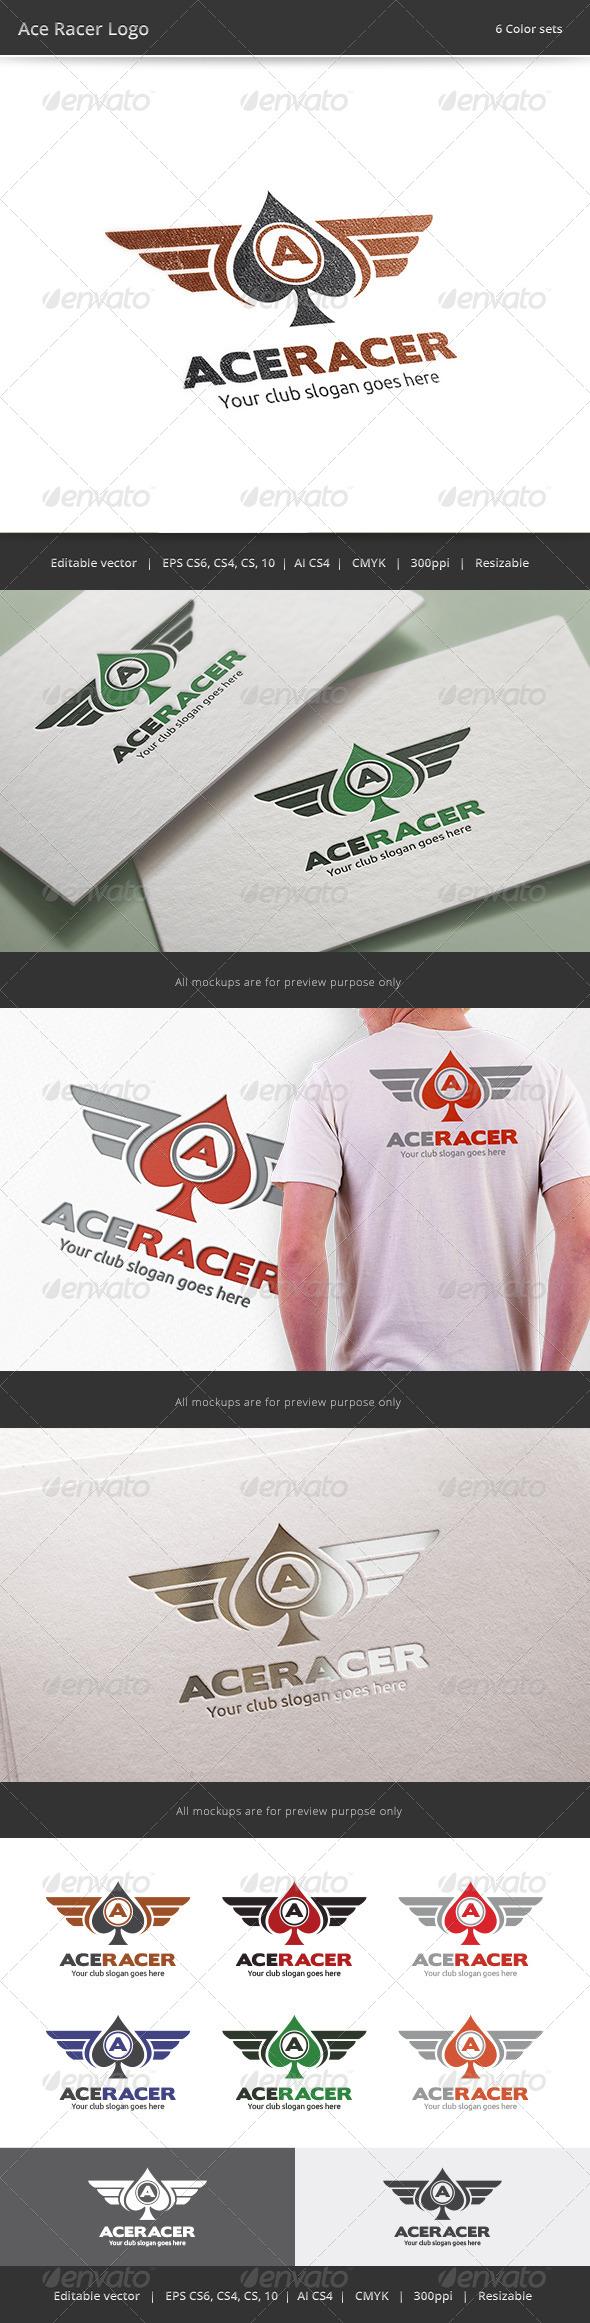 Ace Racer Logo